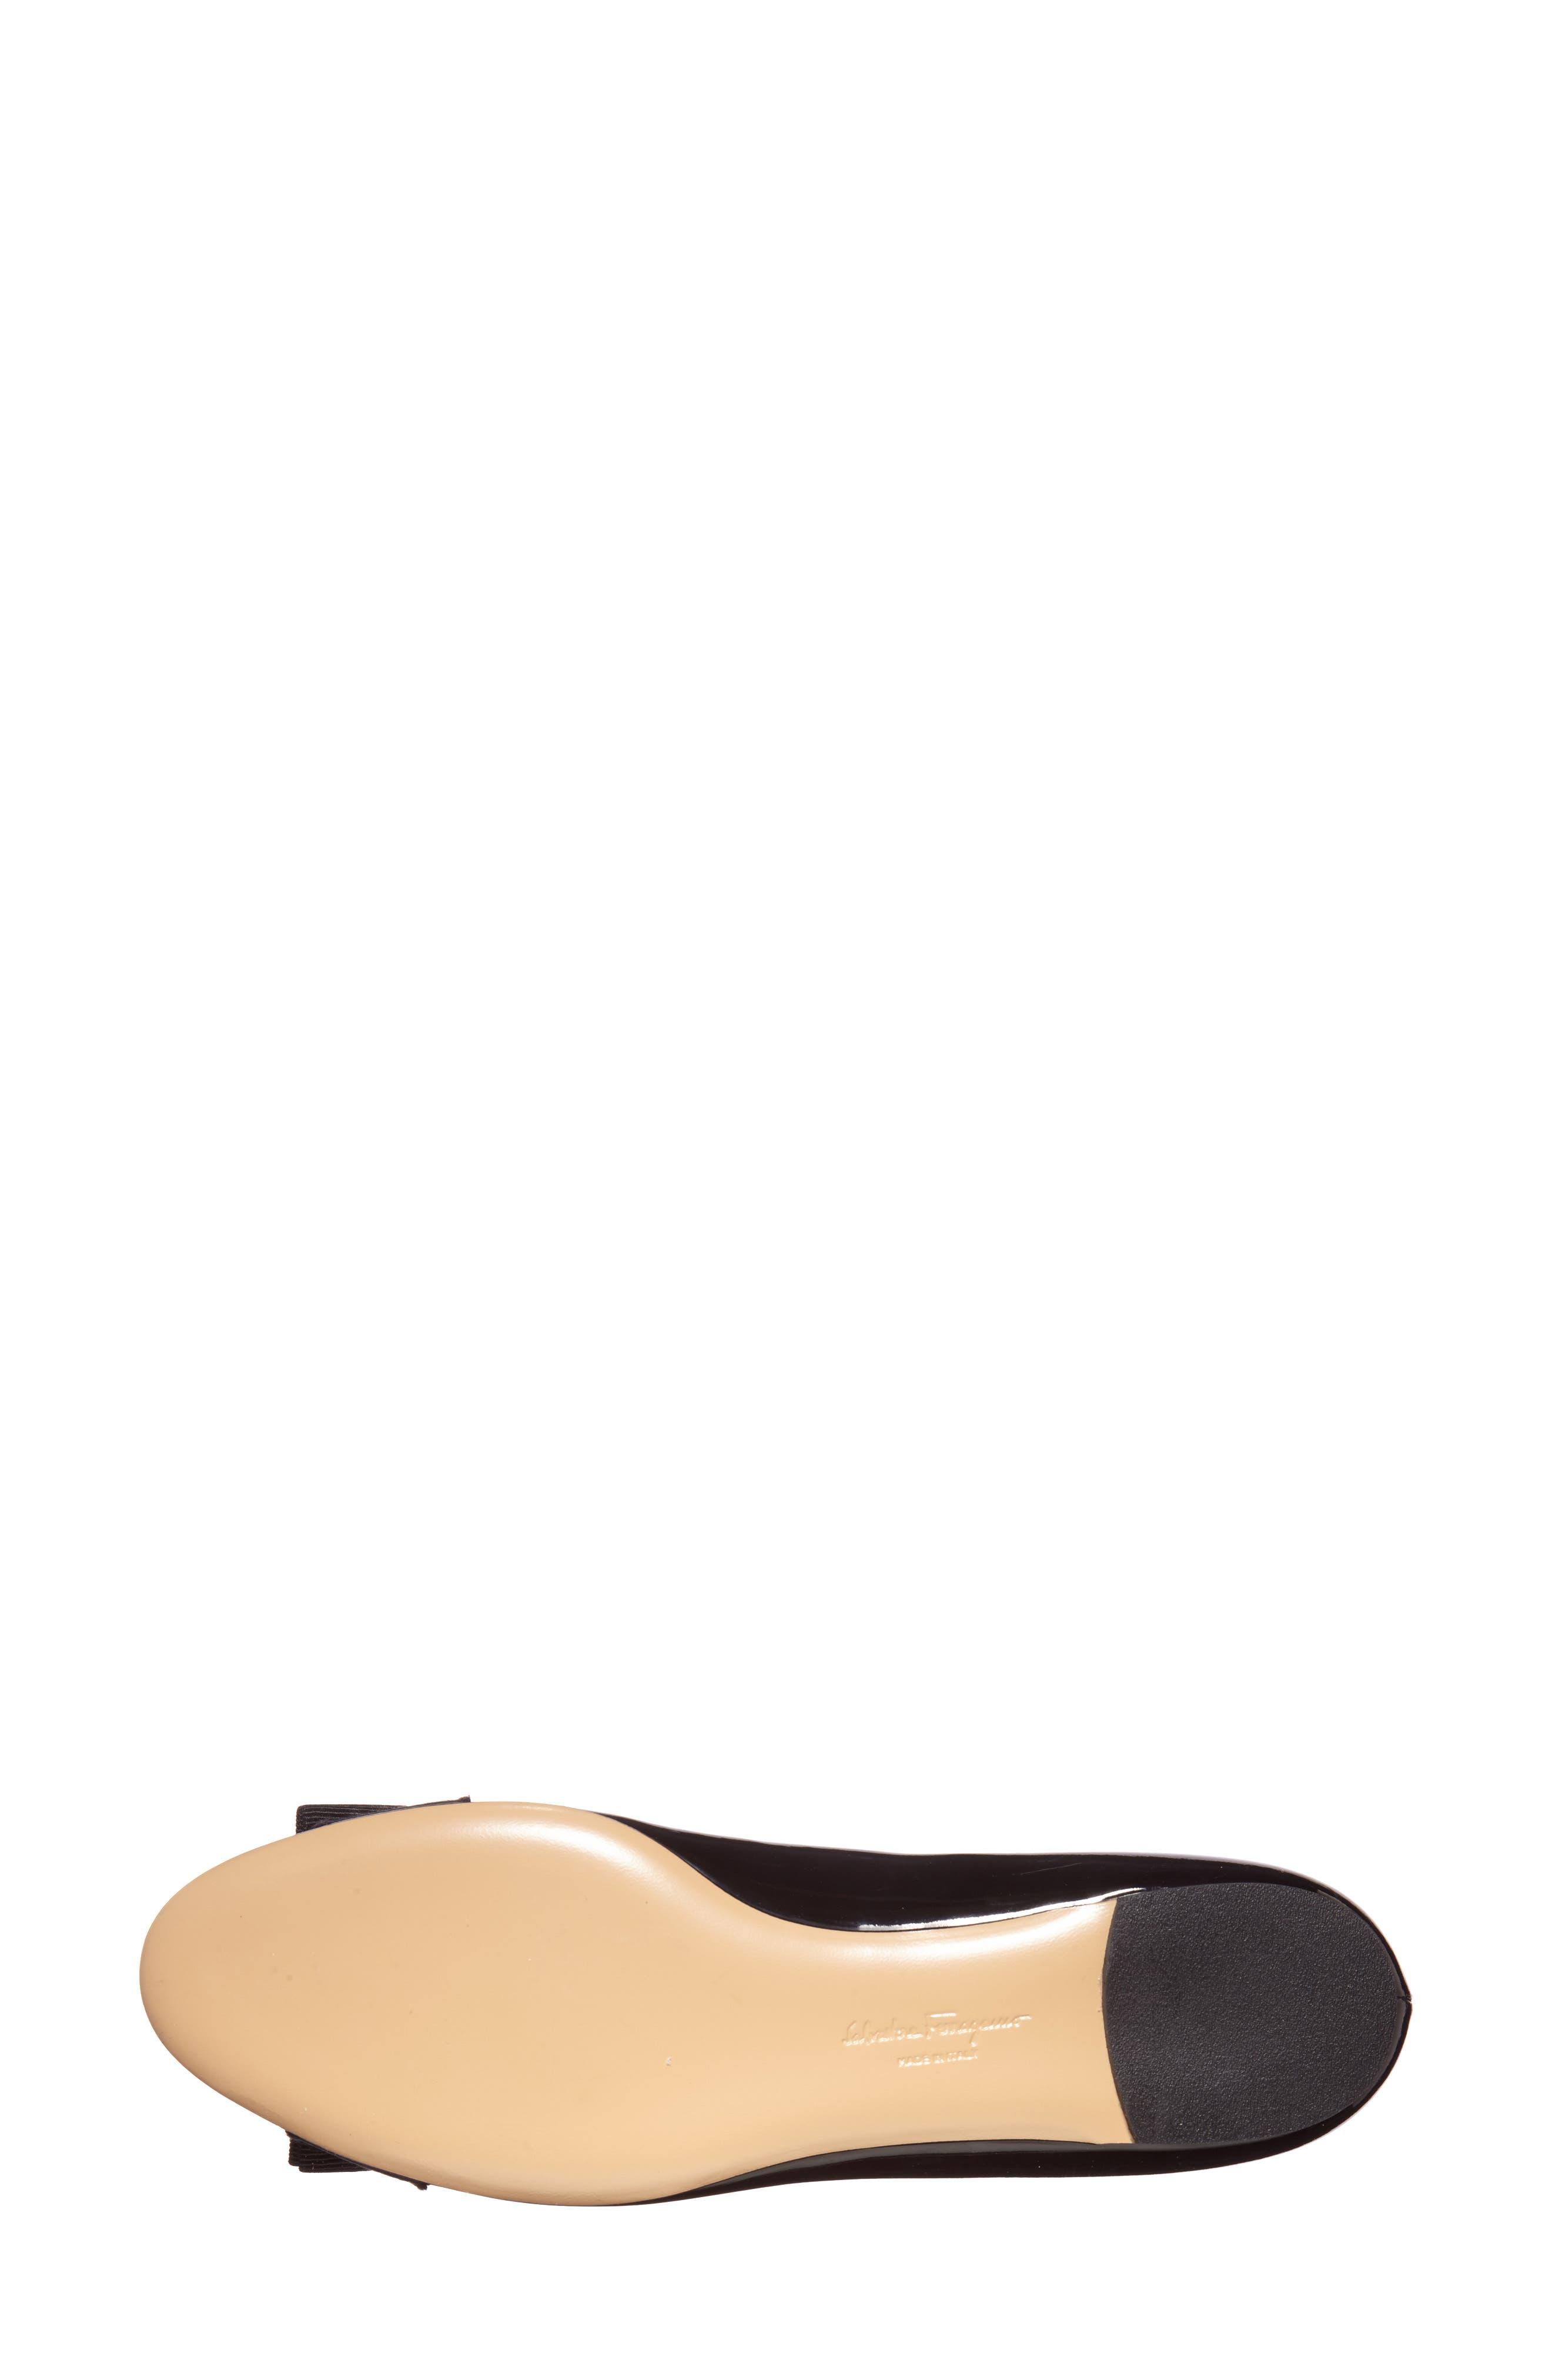 SALVATORE FERRAGAMO, Varina Leather Flat, Alternate thumbnail 5, color, NERO PATENT/ GOLD